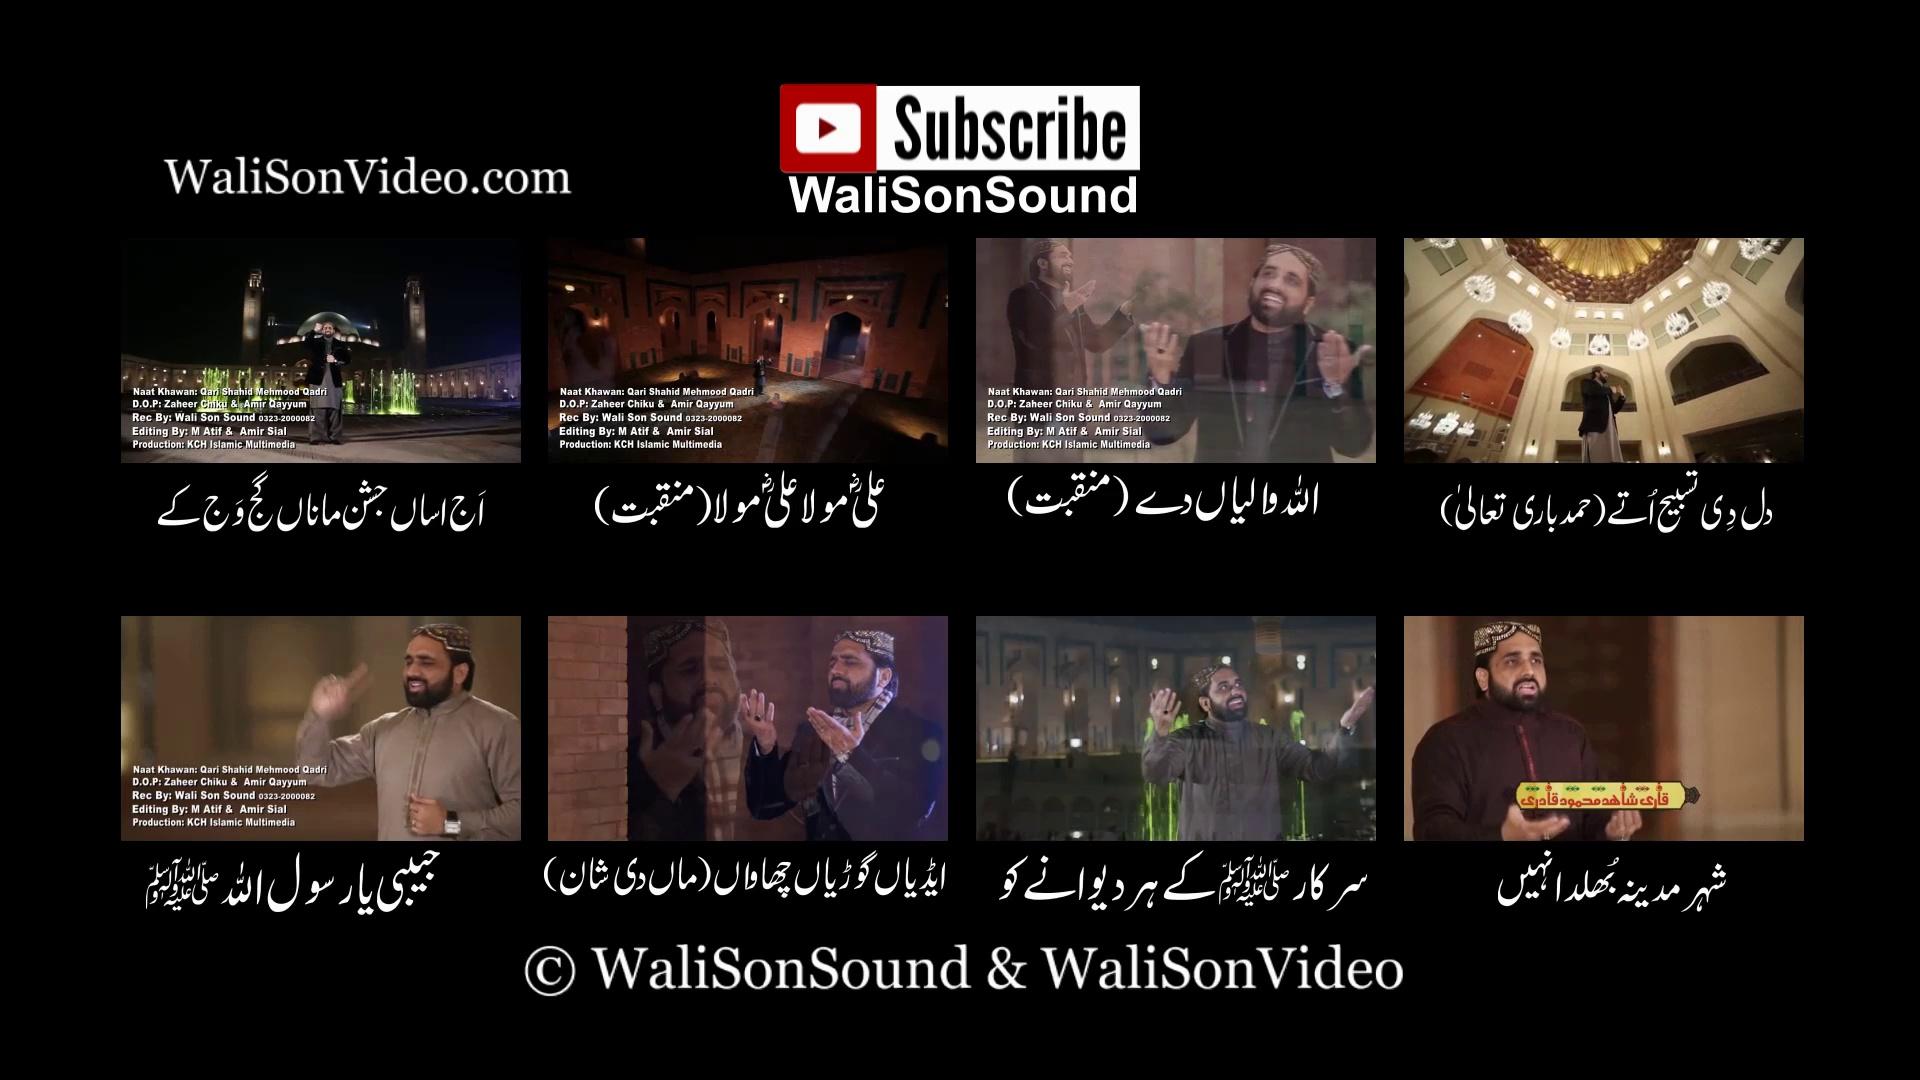 Qari Shahid Mahmood 2015 Promo - Jhang Tv